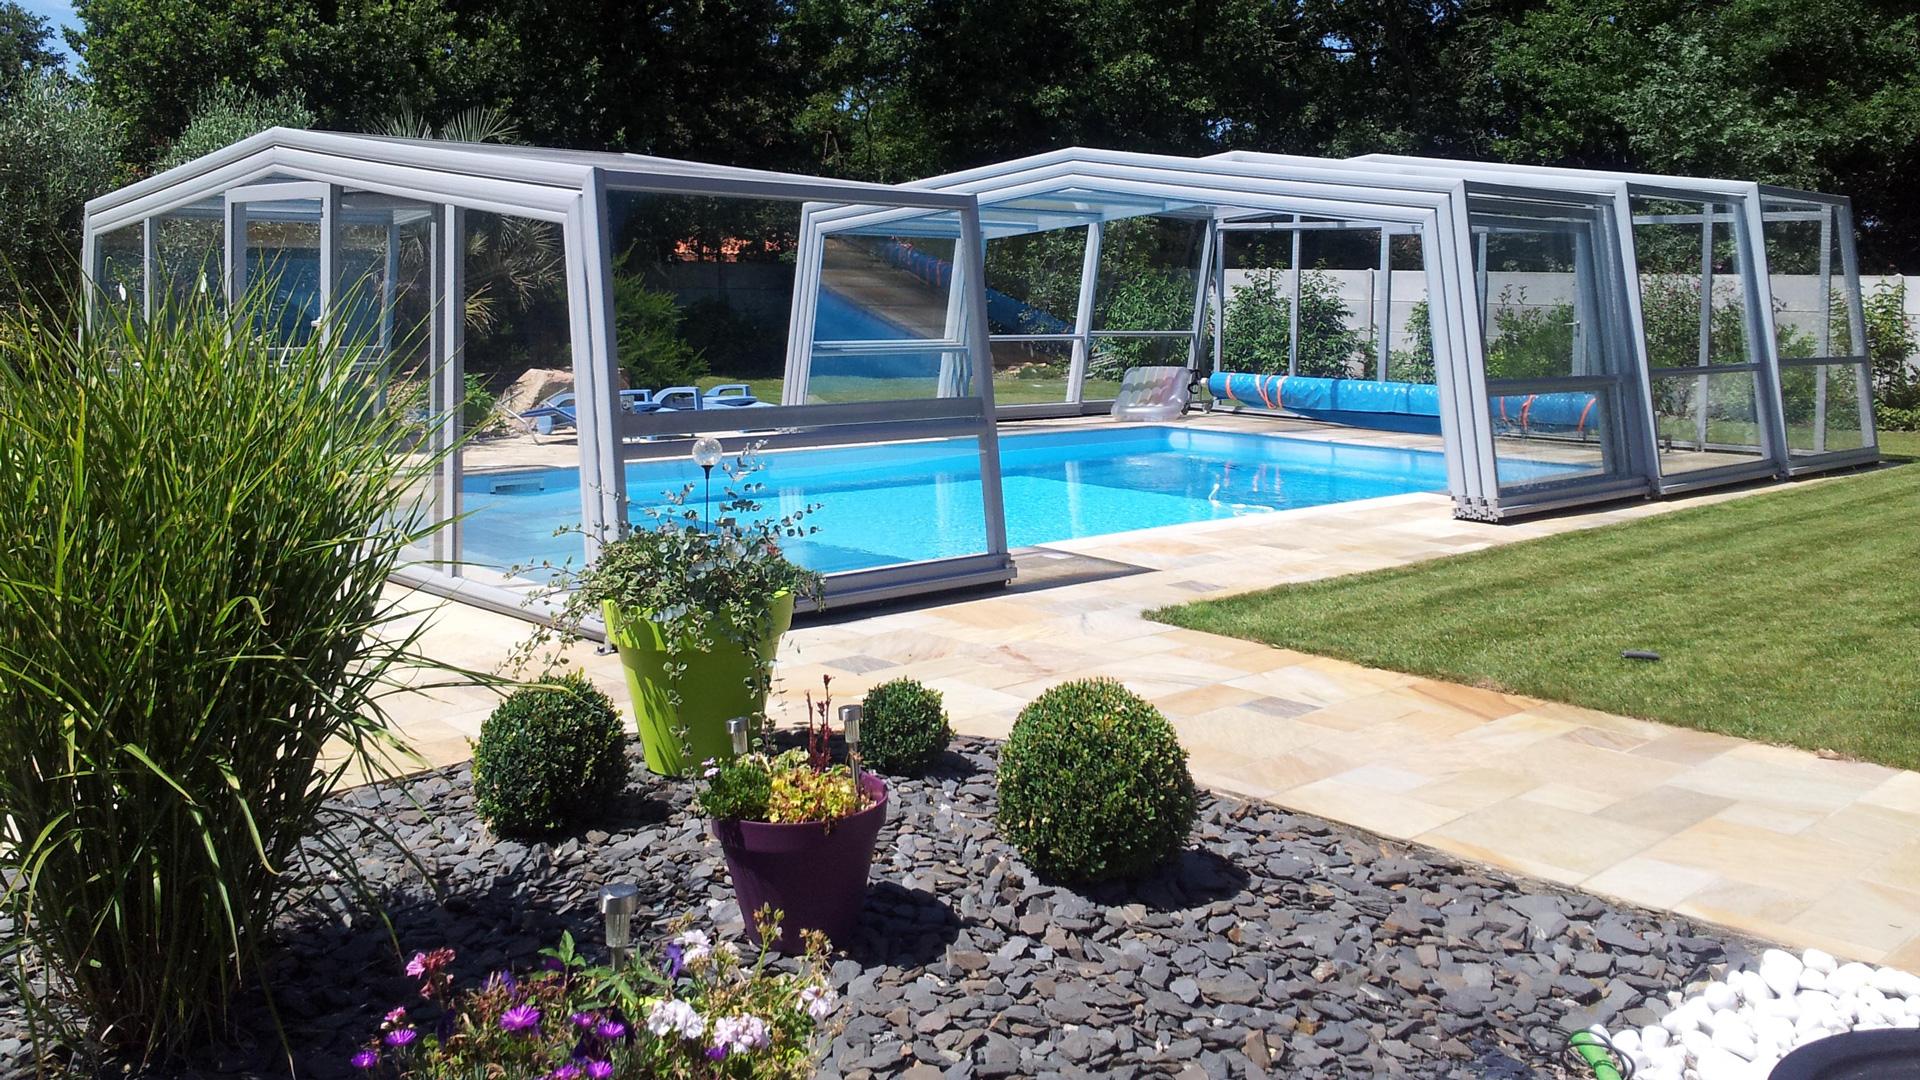 Ortbauer Pool Hochüberdachung